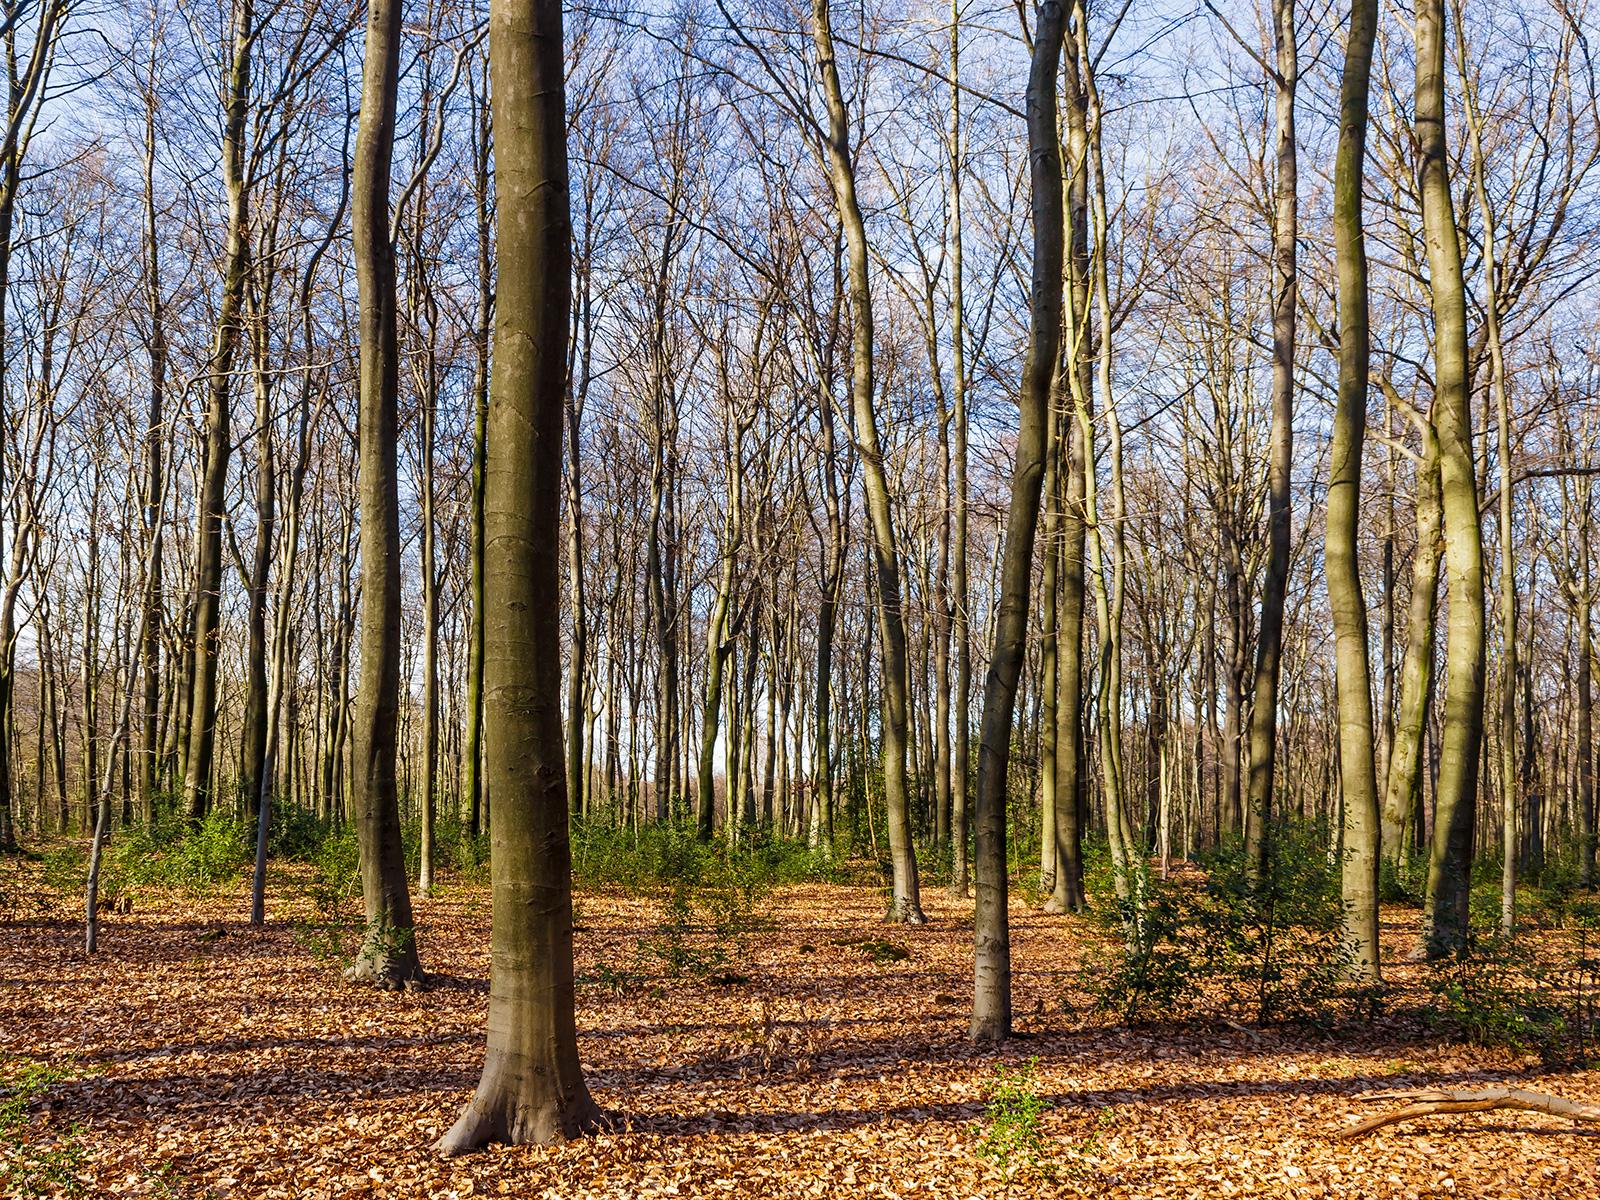 Altersklasse: Baumholz